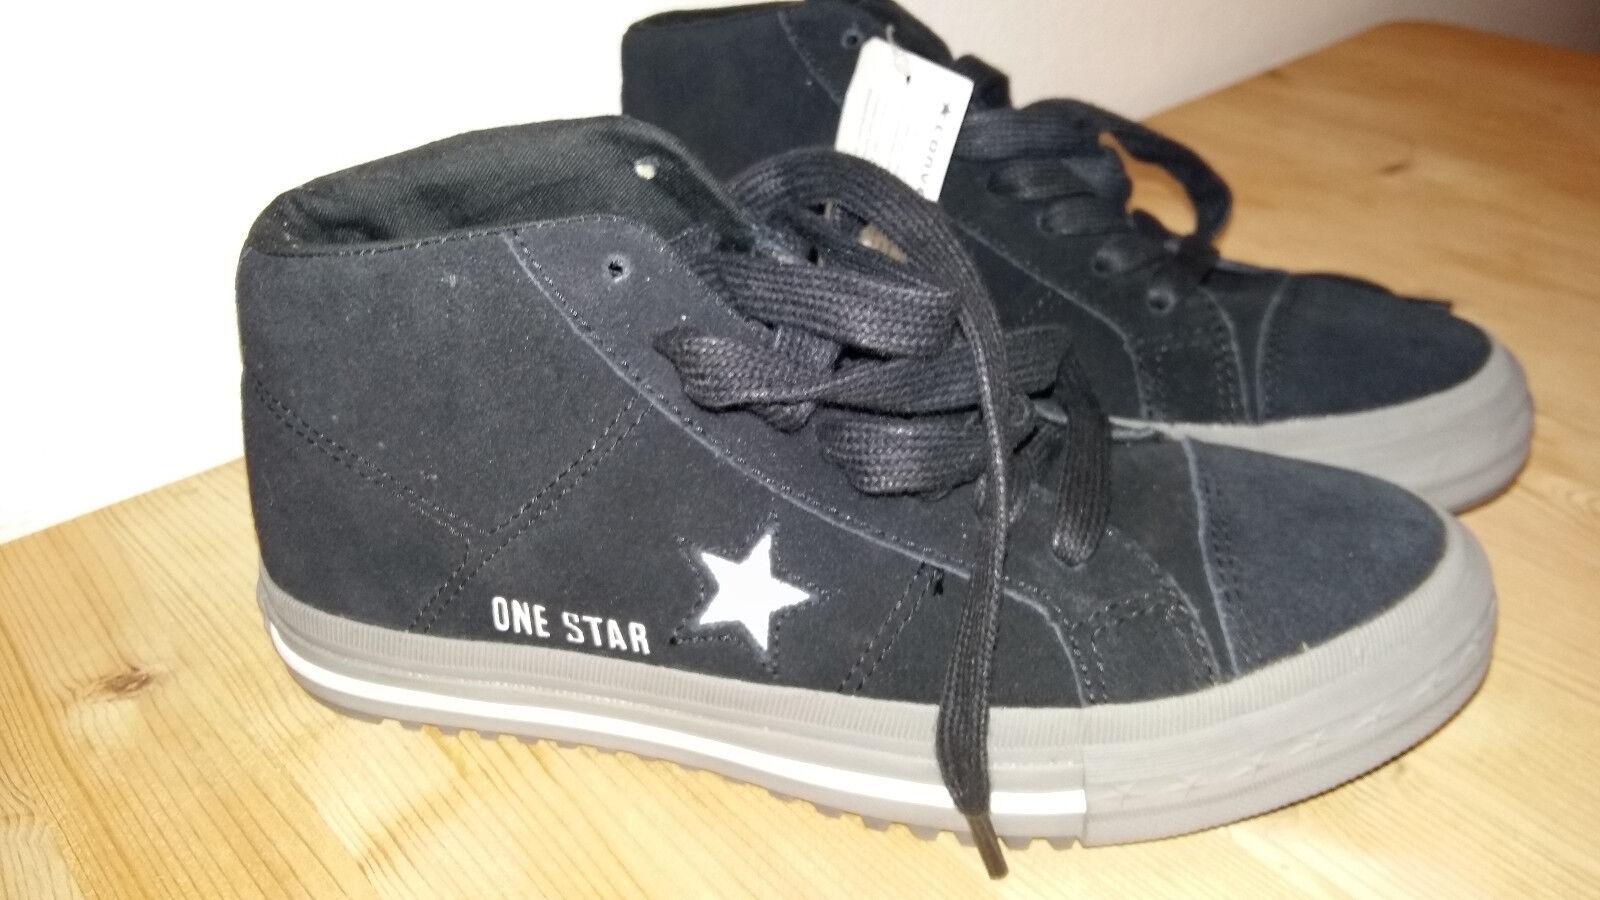 Converse ONE STAR MID Gr.37,5   UK 5  schwarz   Nubuck Leder 111284 NEU 5399f7